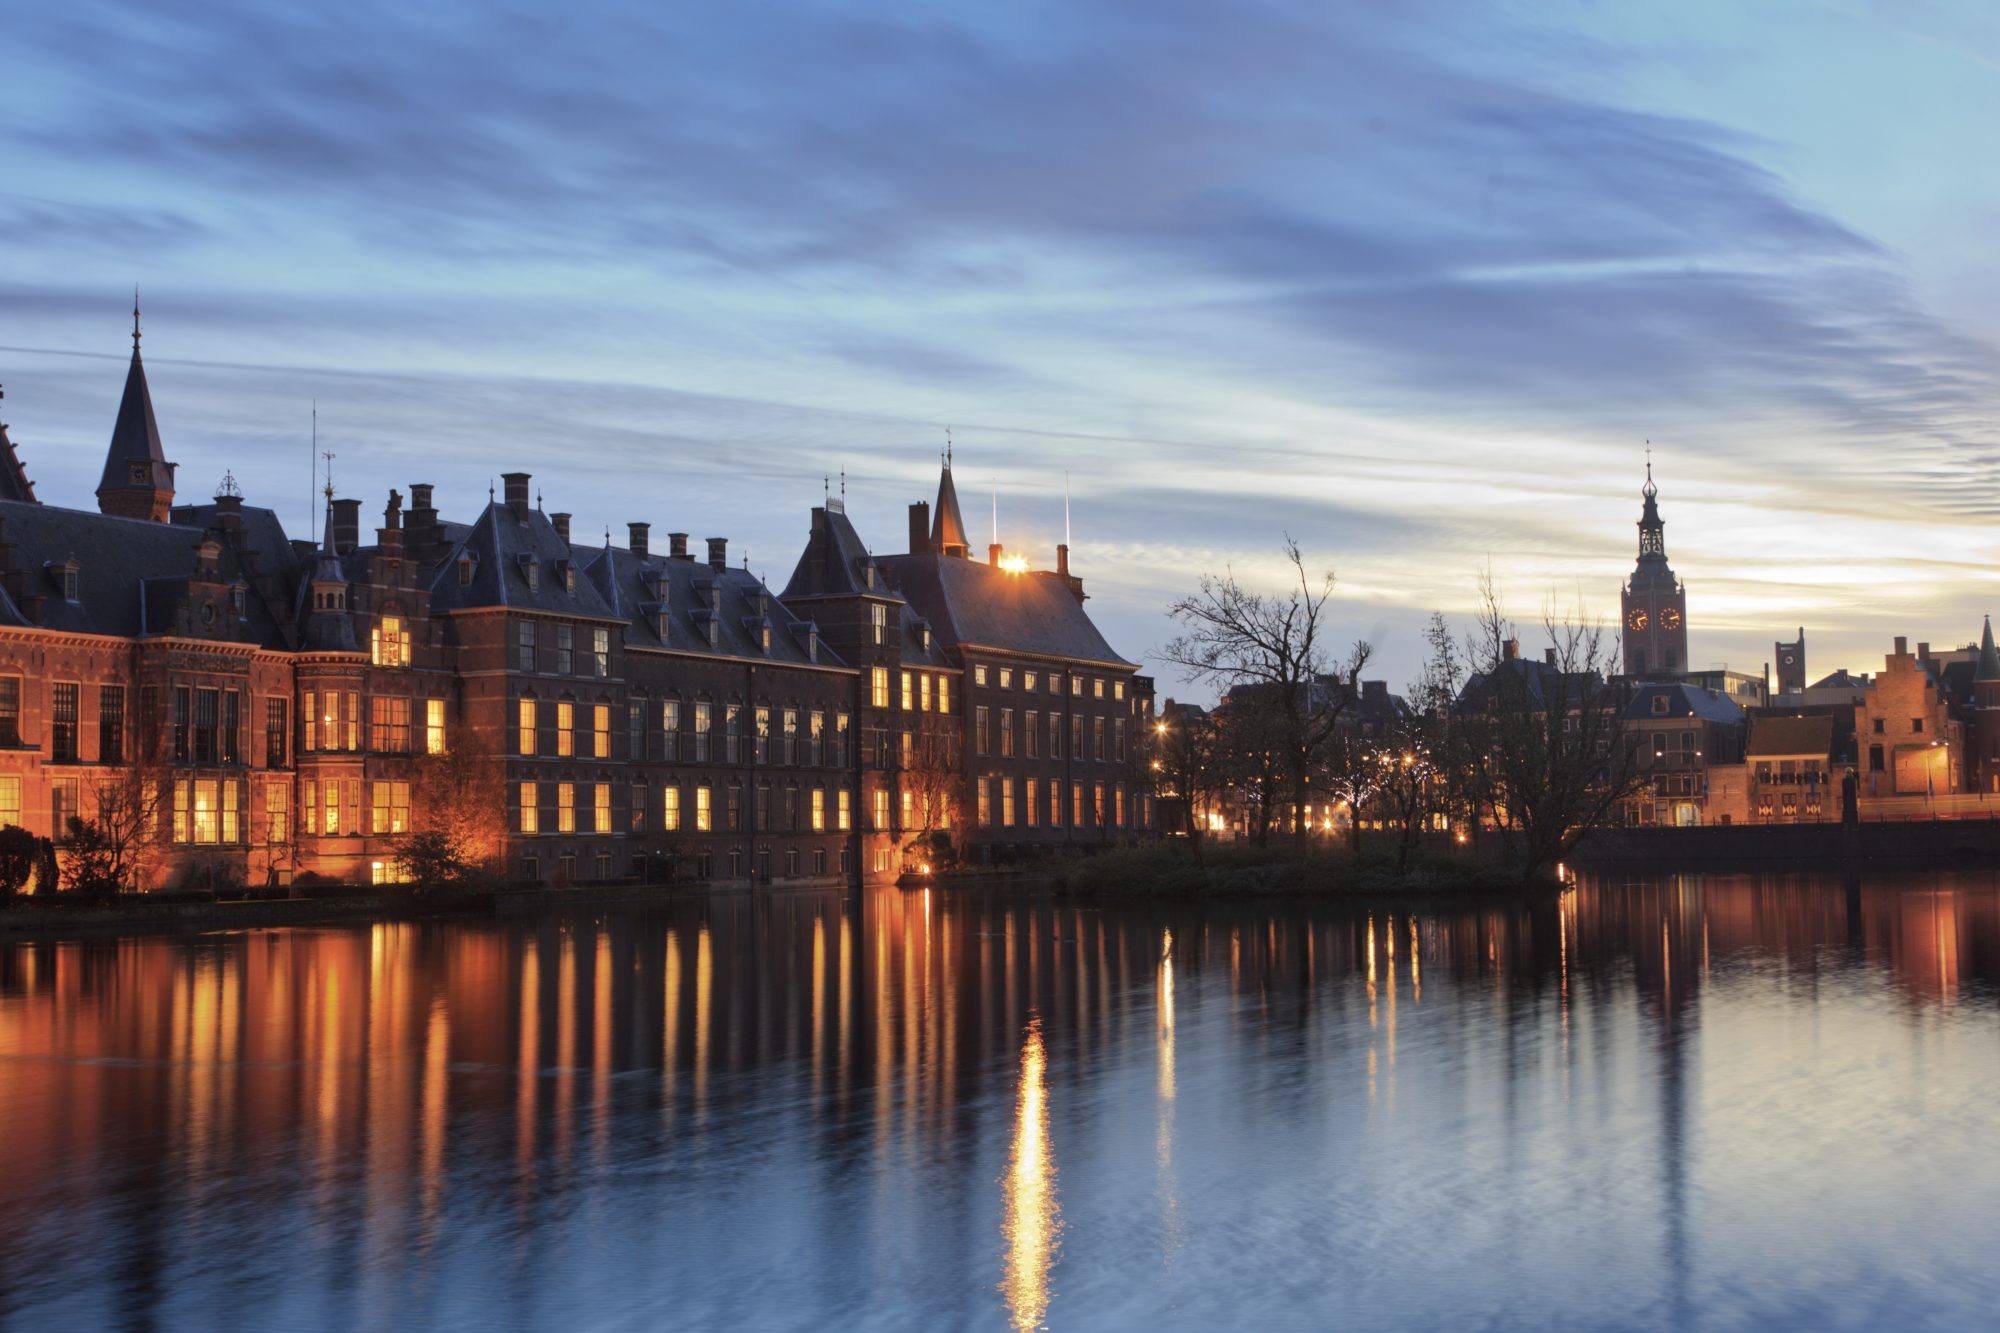 illuminated parliament buildings along the Hofvijver; The Hague, Netherlands